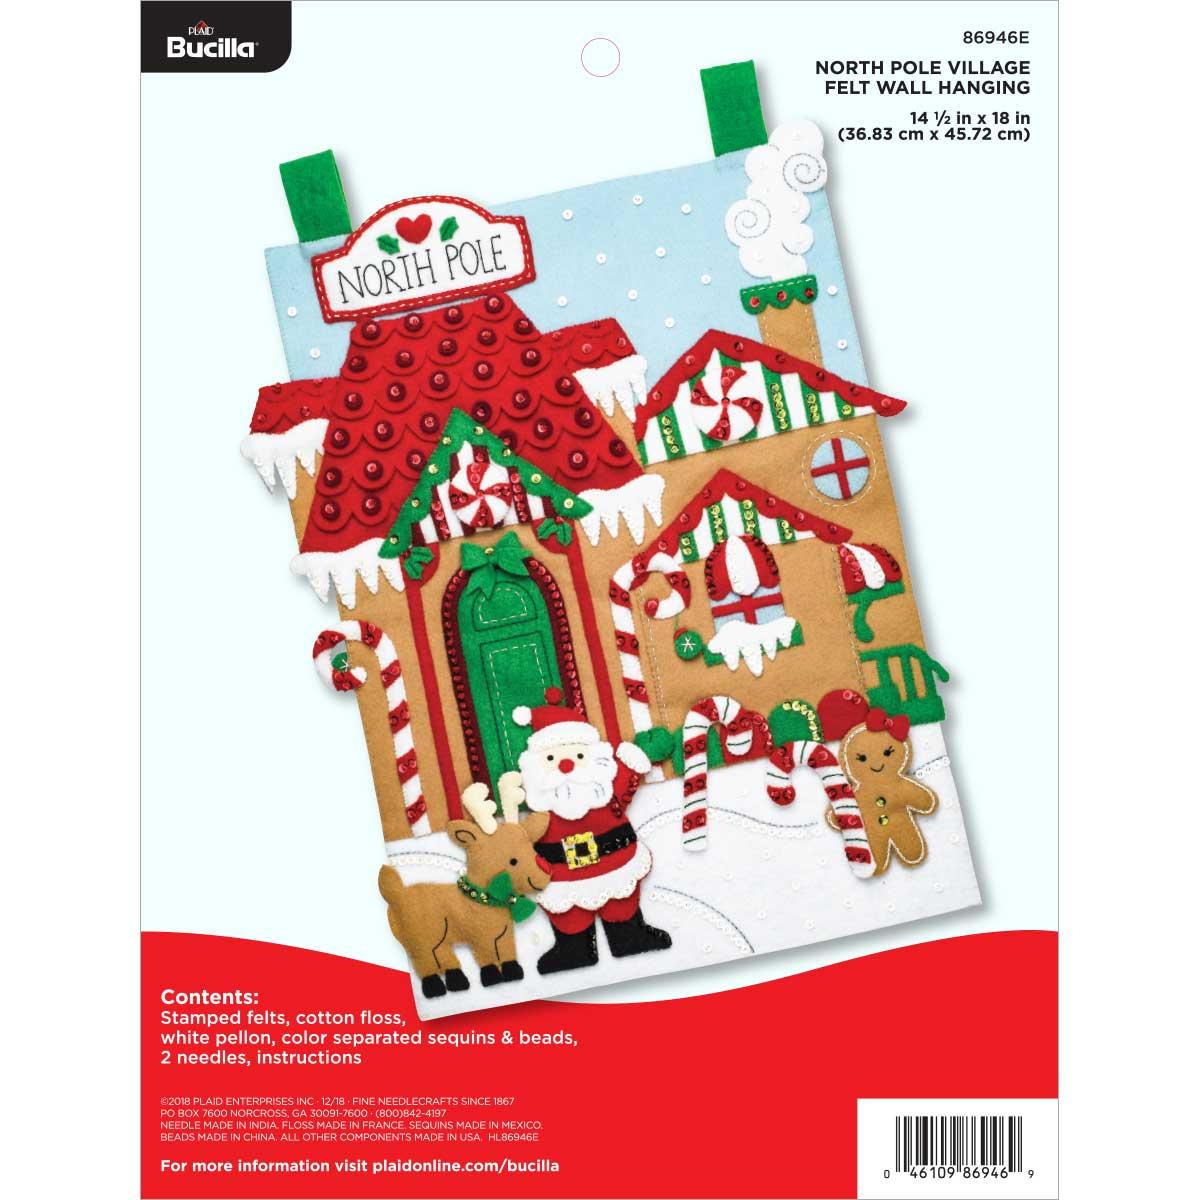 Bucilla ® Seasonal - Felt - Home Decor - North Pole Village Wall Hanging